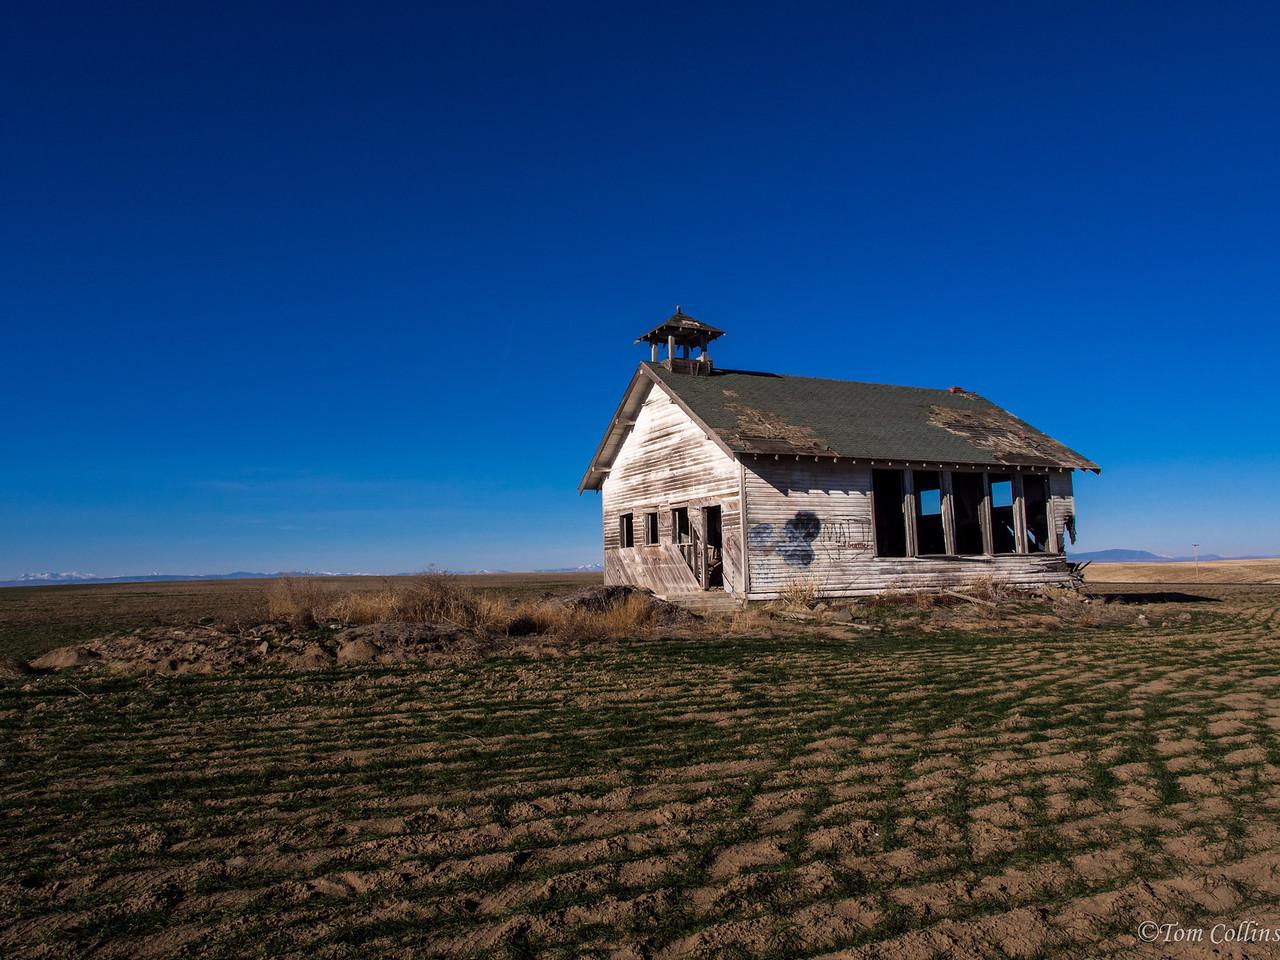 20131121-PB210062-Edit Team Rust ~ Douglas County